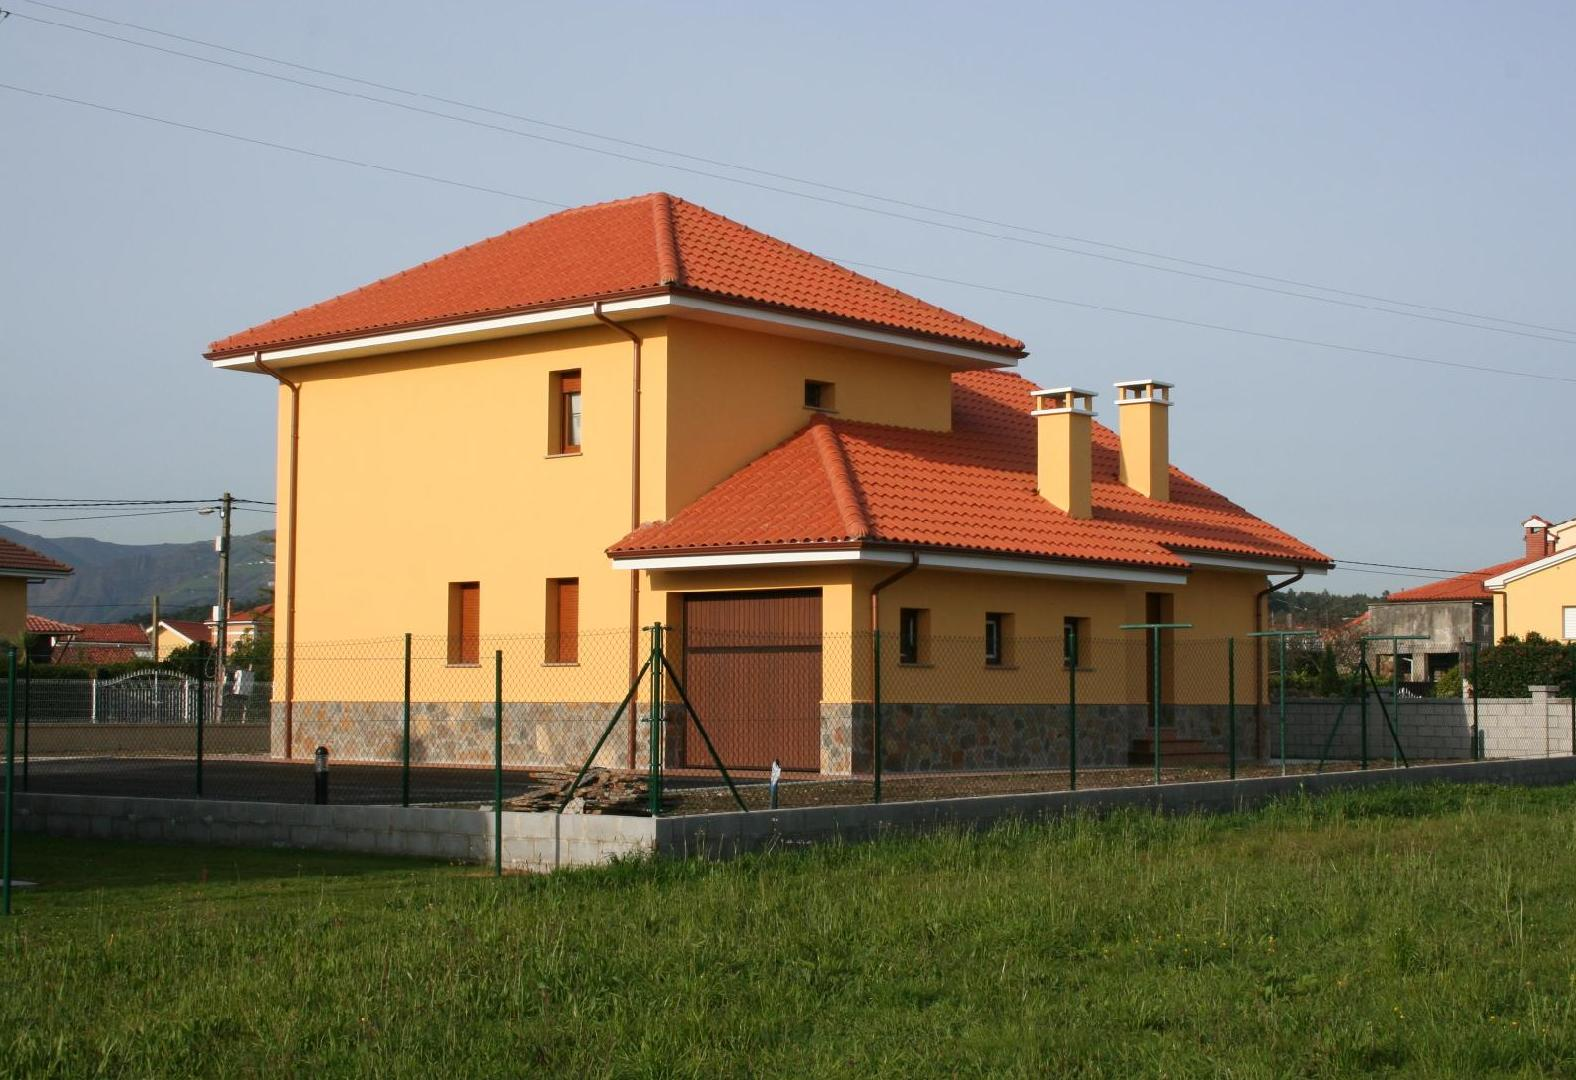 Arquitecto en cudillero asturias vivienda unifamiliar - Arquitectos asturias ...